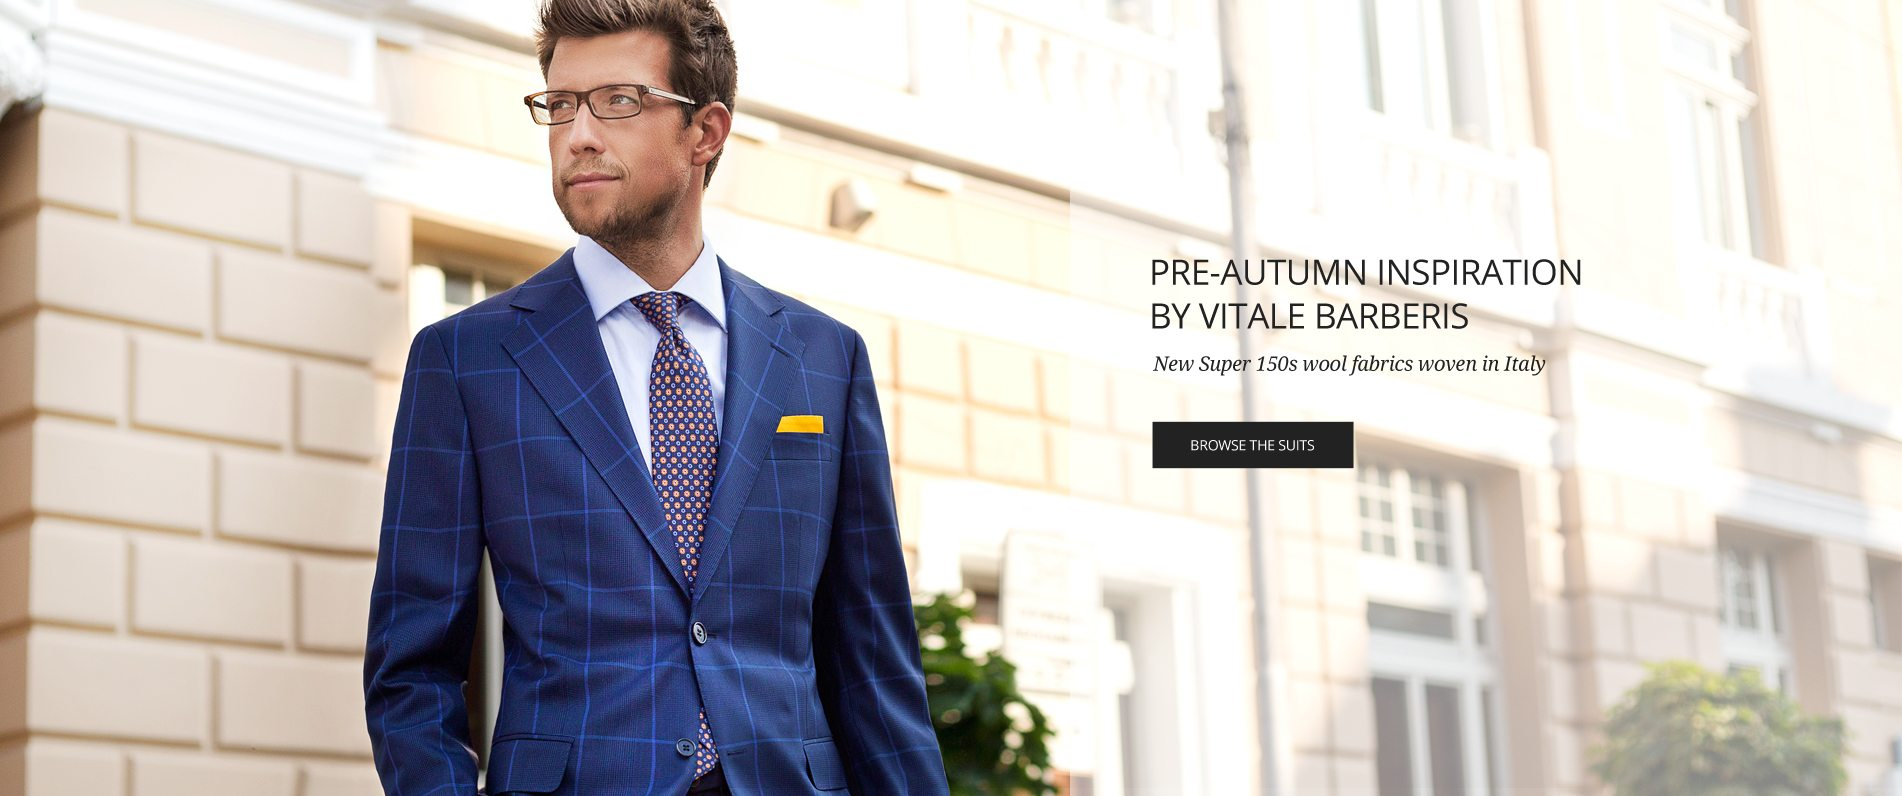 New Vitale Barberis Fabrics